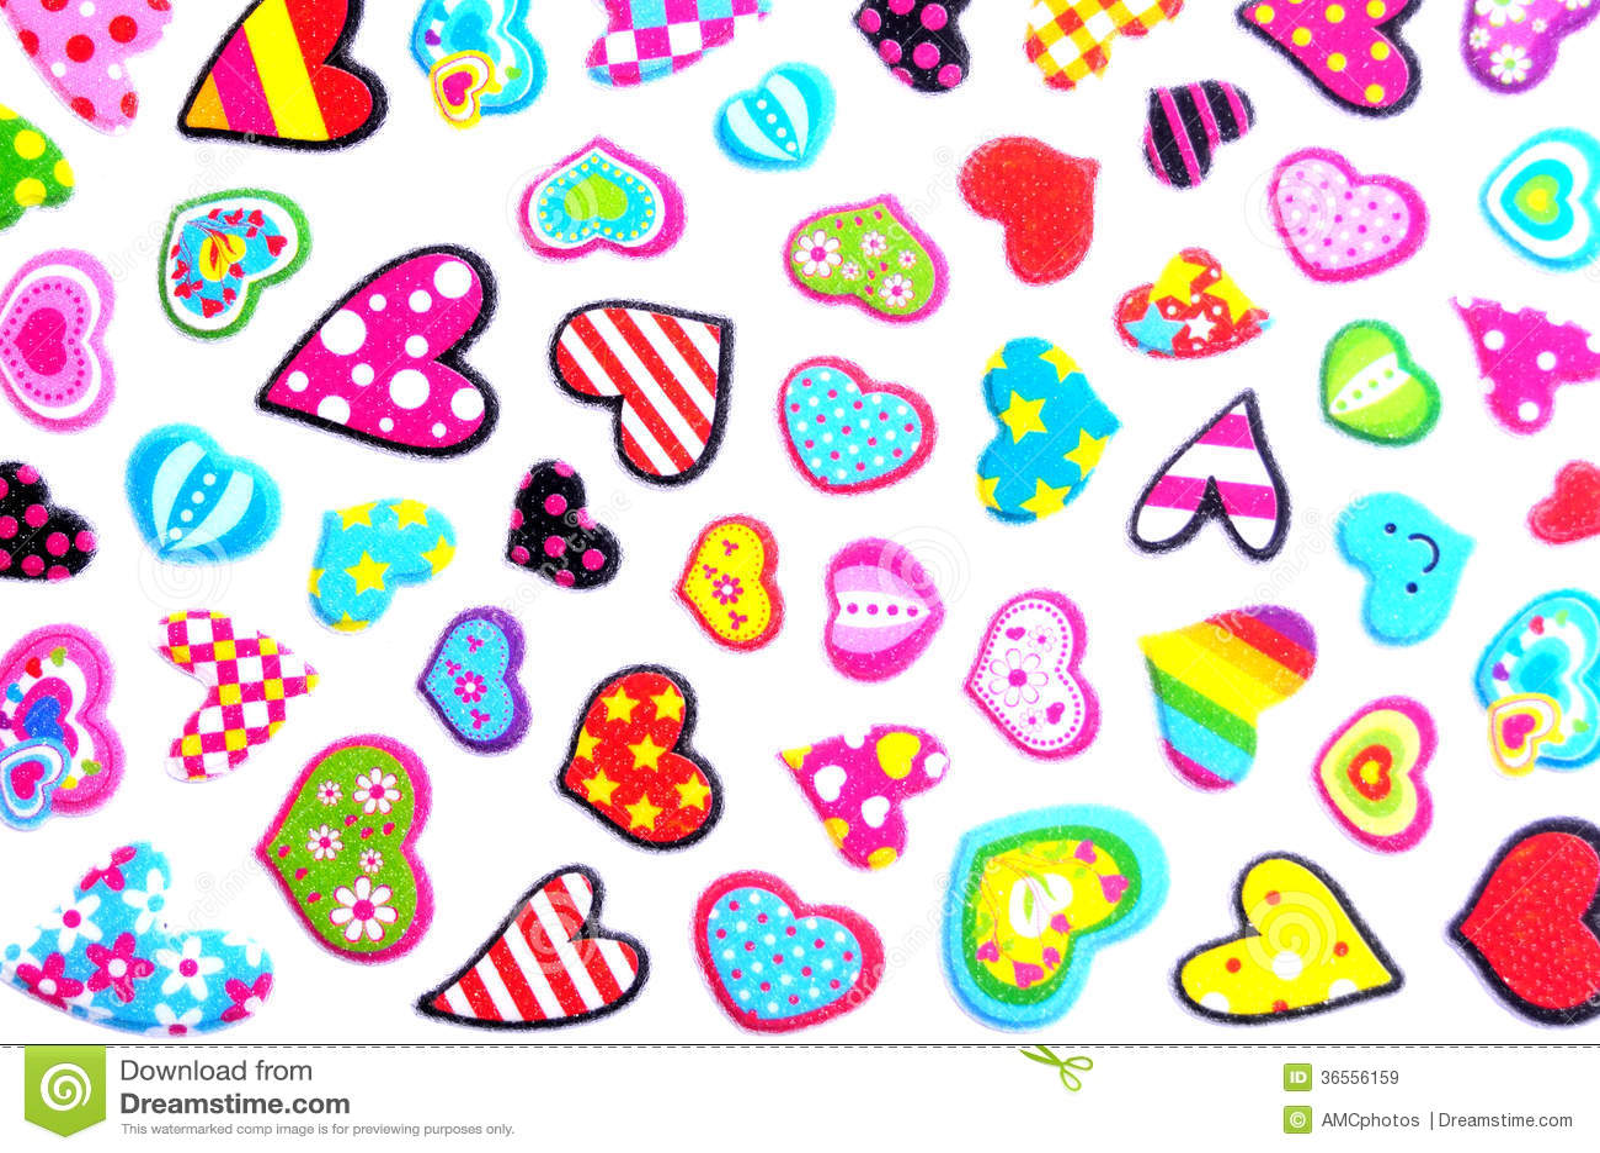 Dibujos De Corazones Coloridos: Small Colorful Hearts Stock Image. Image Of Hearts, Heart